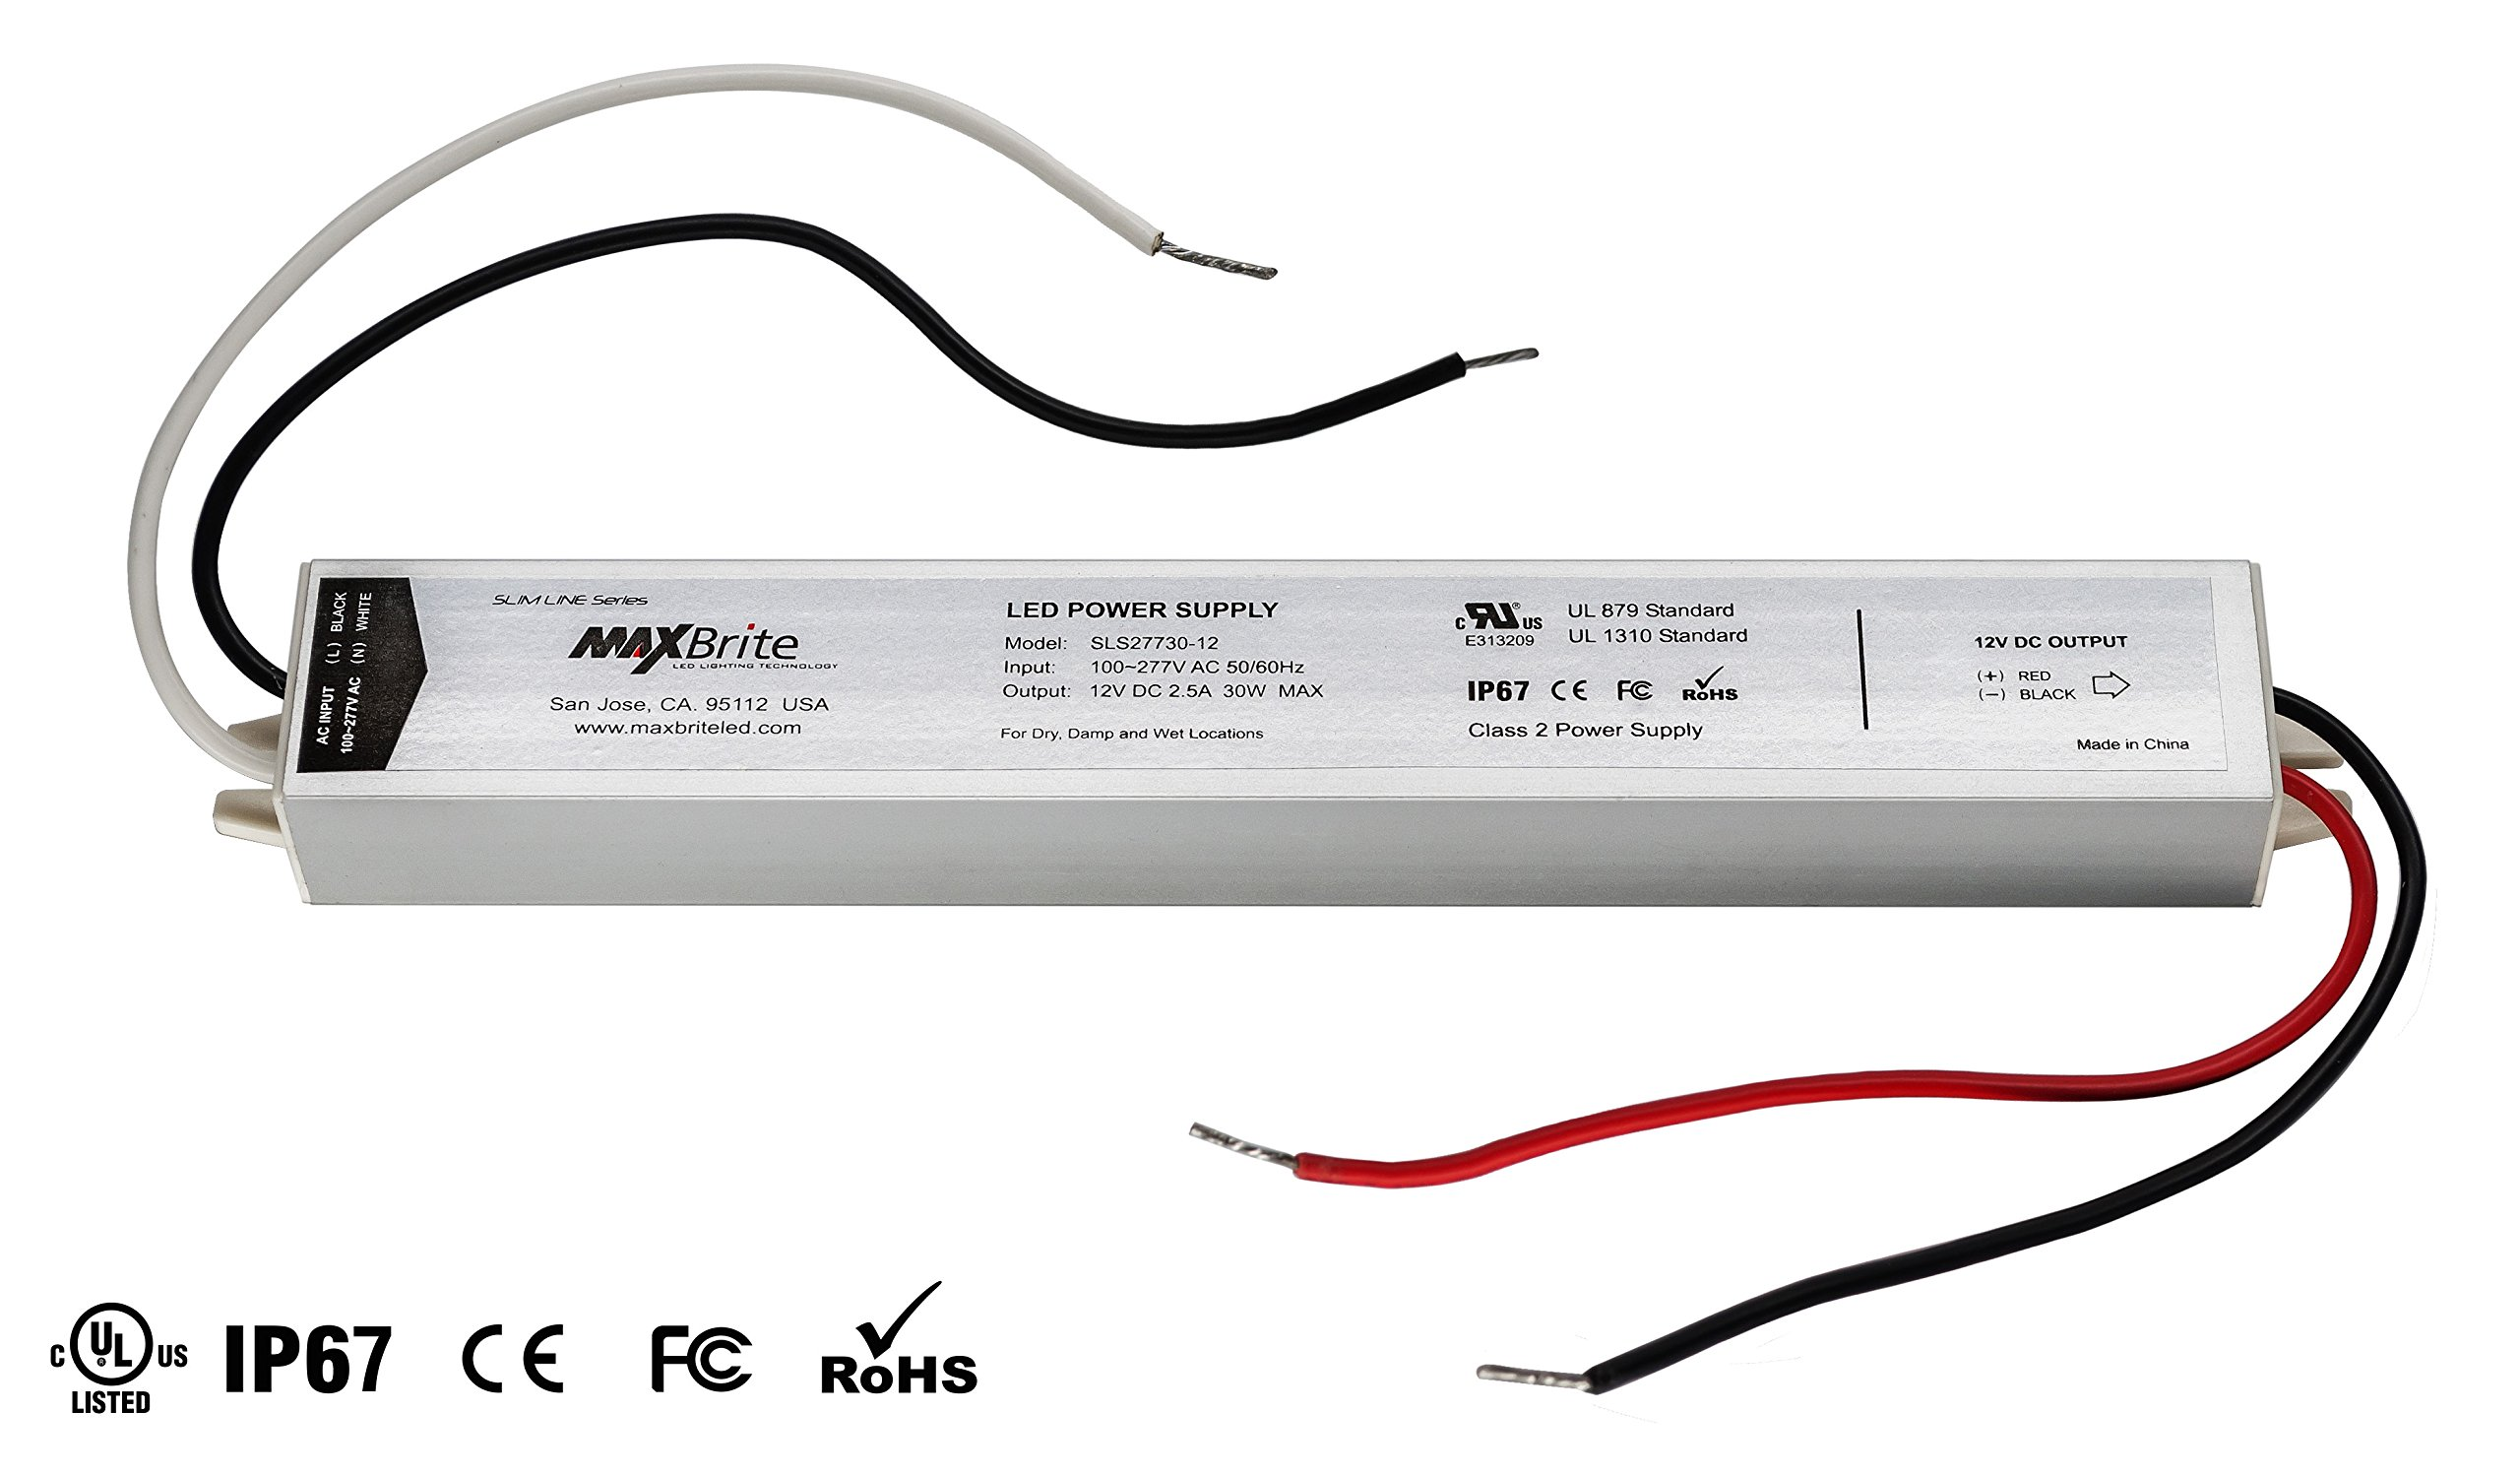 30W LED Power Supply, 12V DC Output, 100-277V AC Input, IP67 Waterproof, UL/cUL Certified, CE, RoHS, Class 2